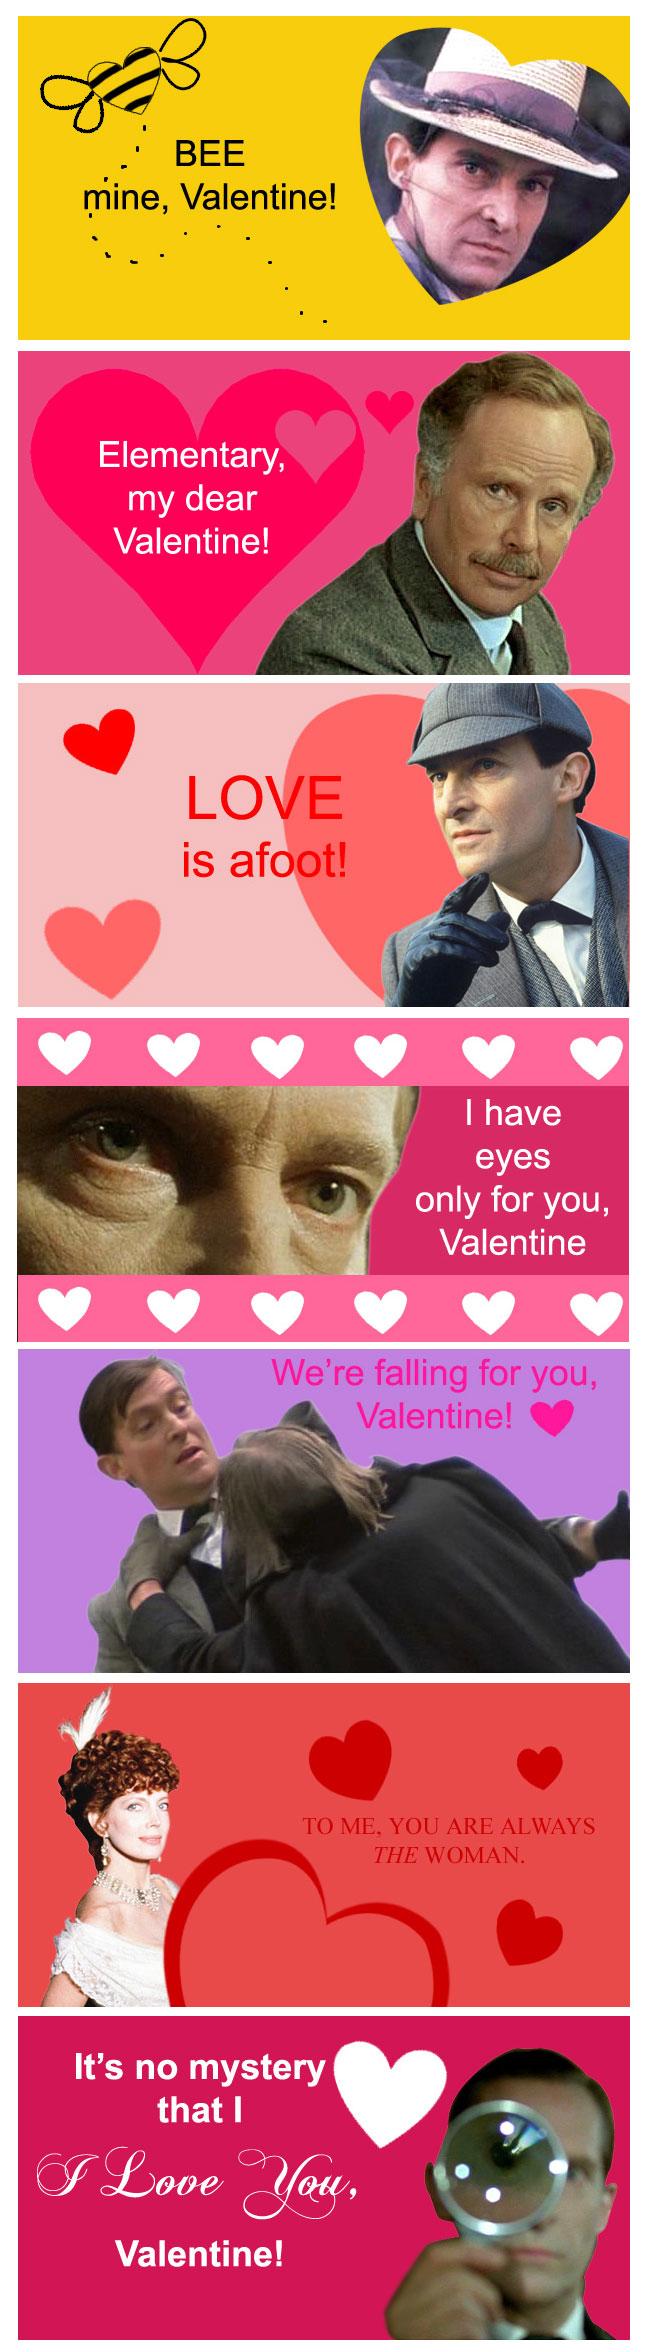 Sherlock Holmes Valentines By Silvre Sherlock Holmes Valentines By Silvre